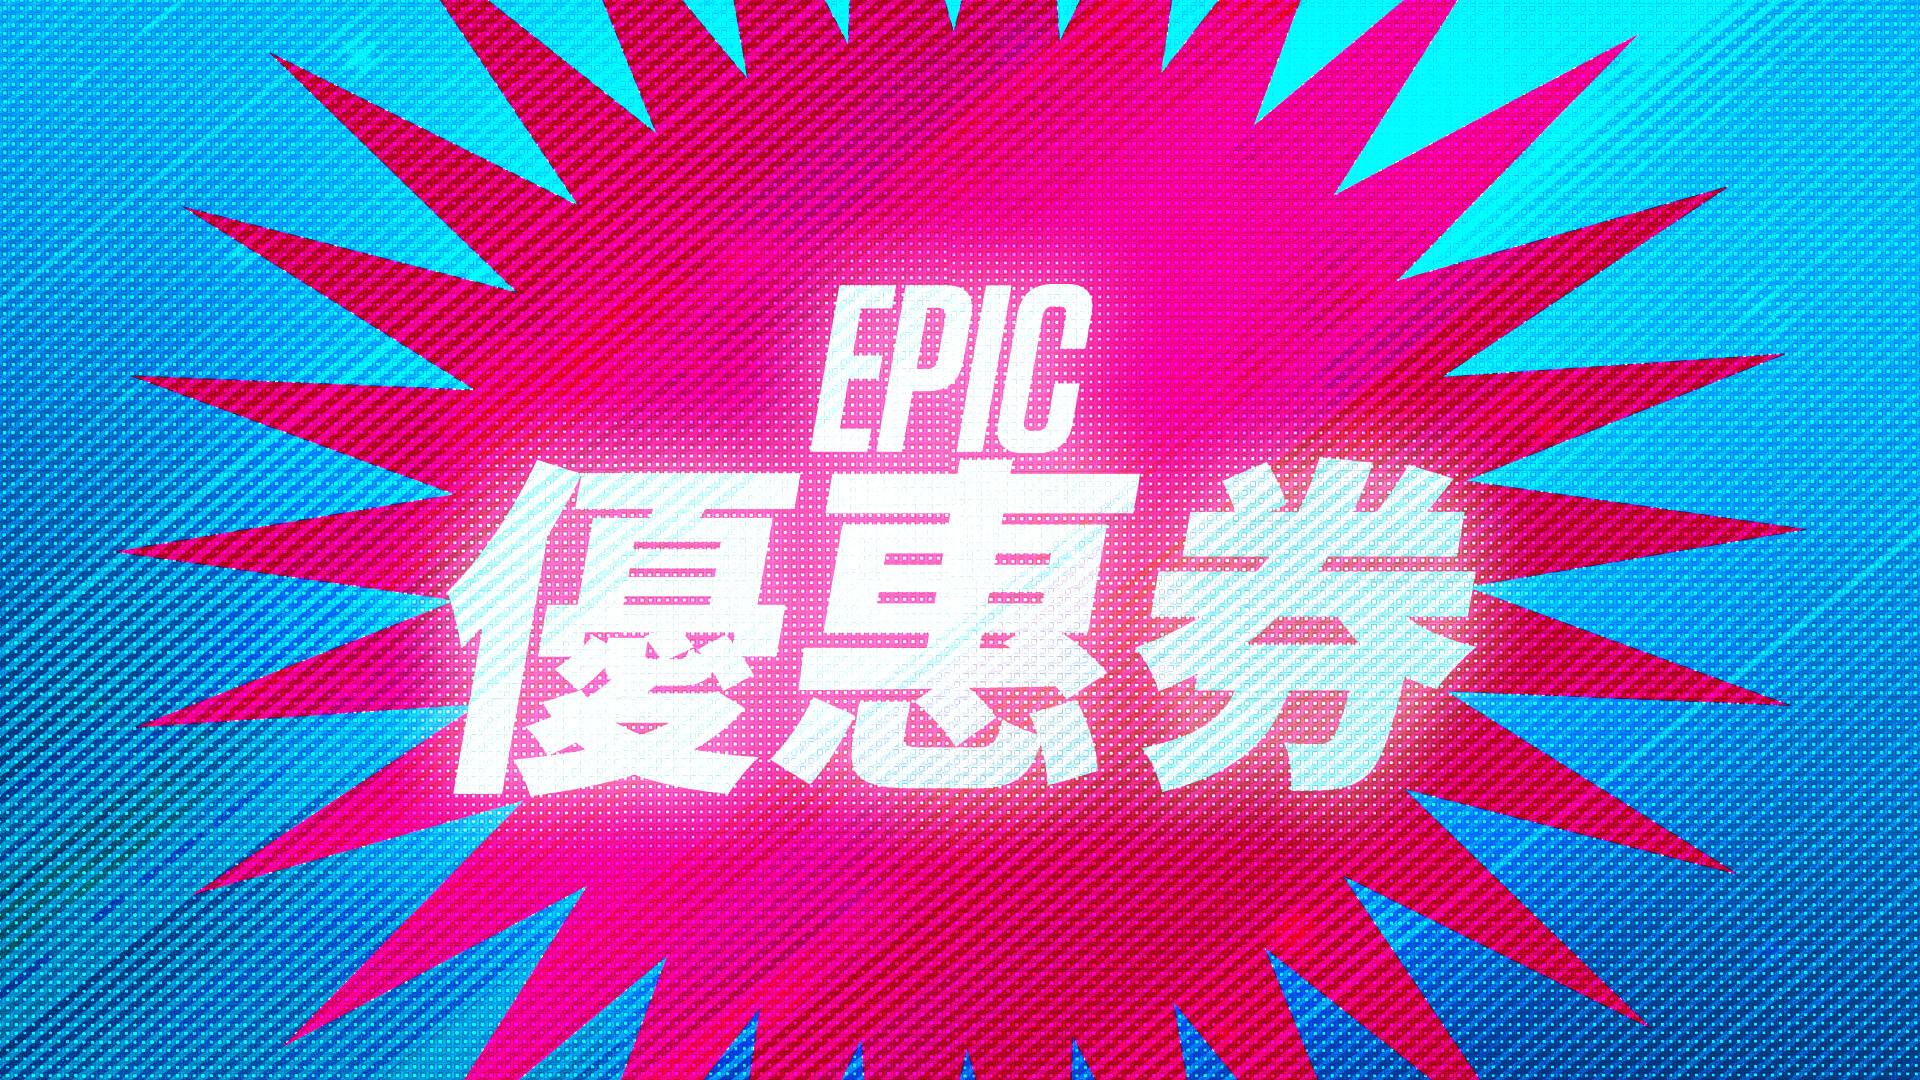 ZhTW EGS MegaSale Coupon Banner